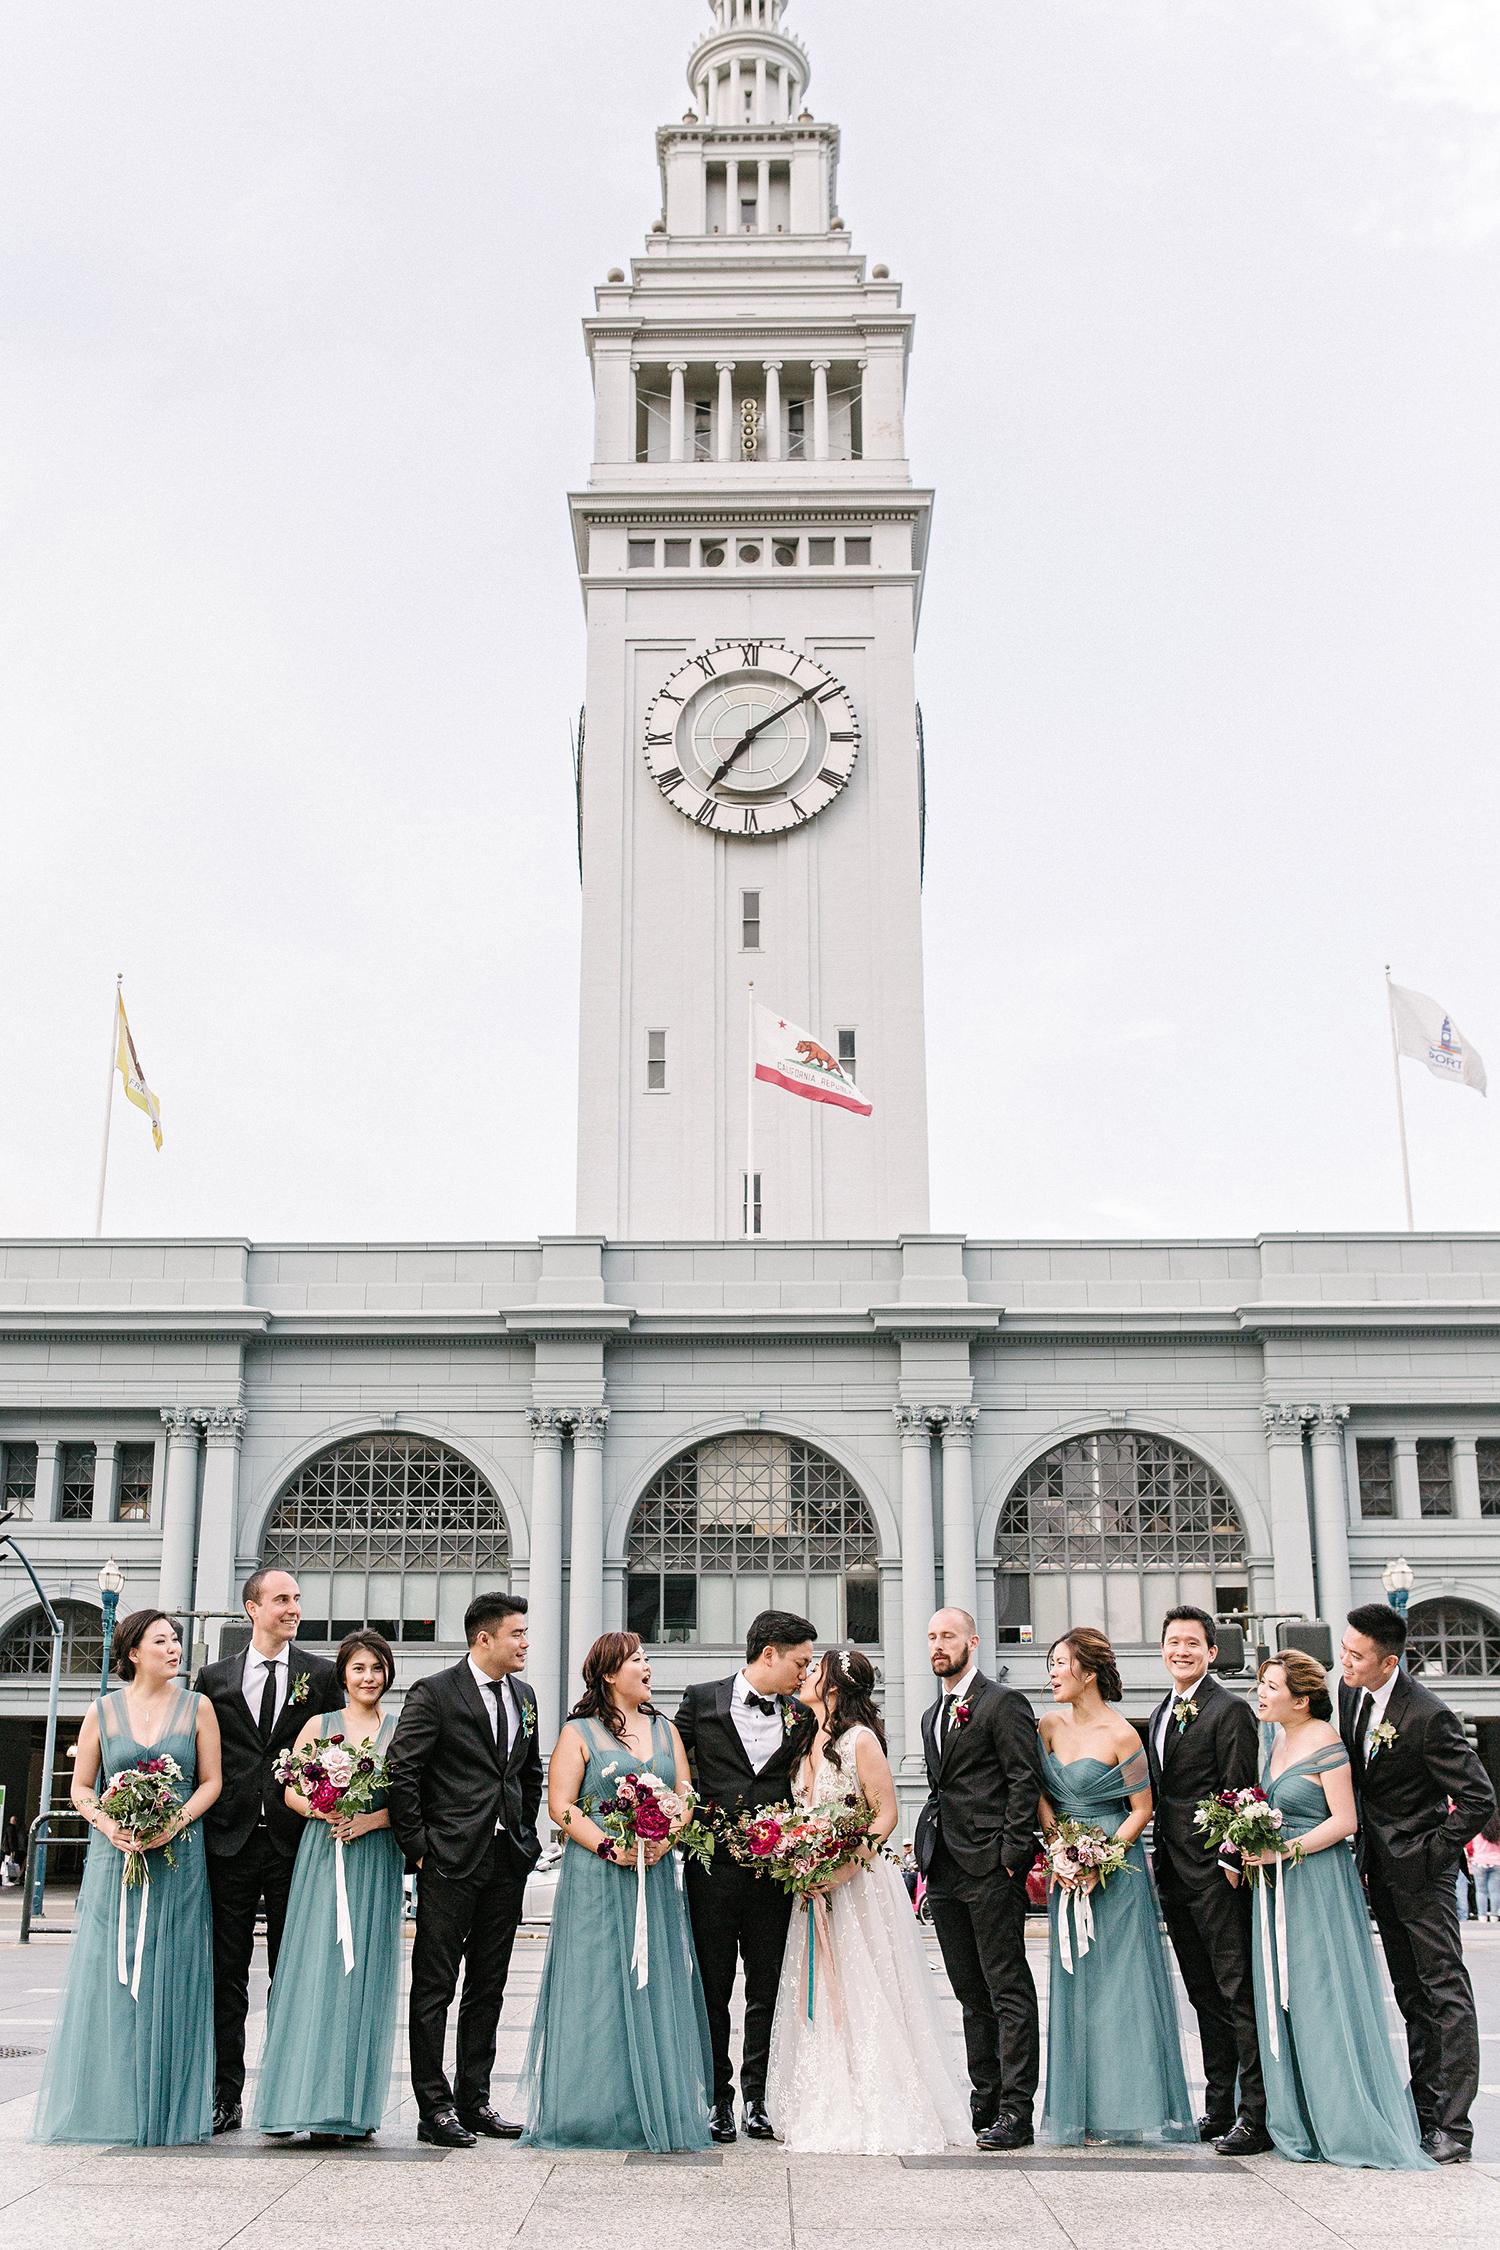 stephanie tim wedding bridal party and clocktower